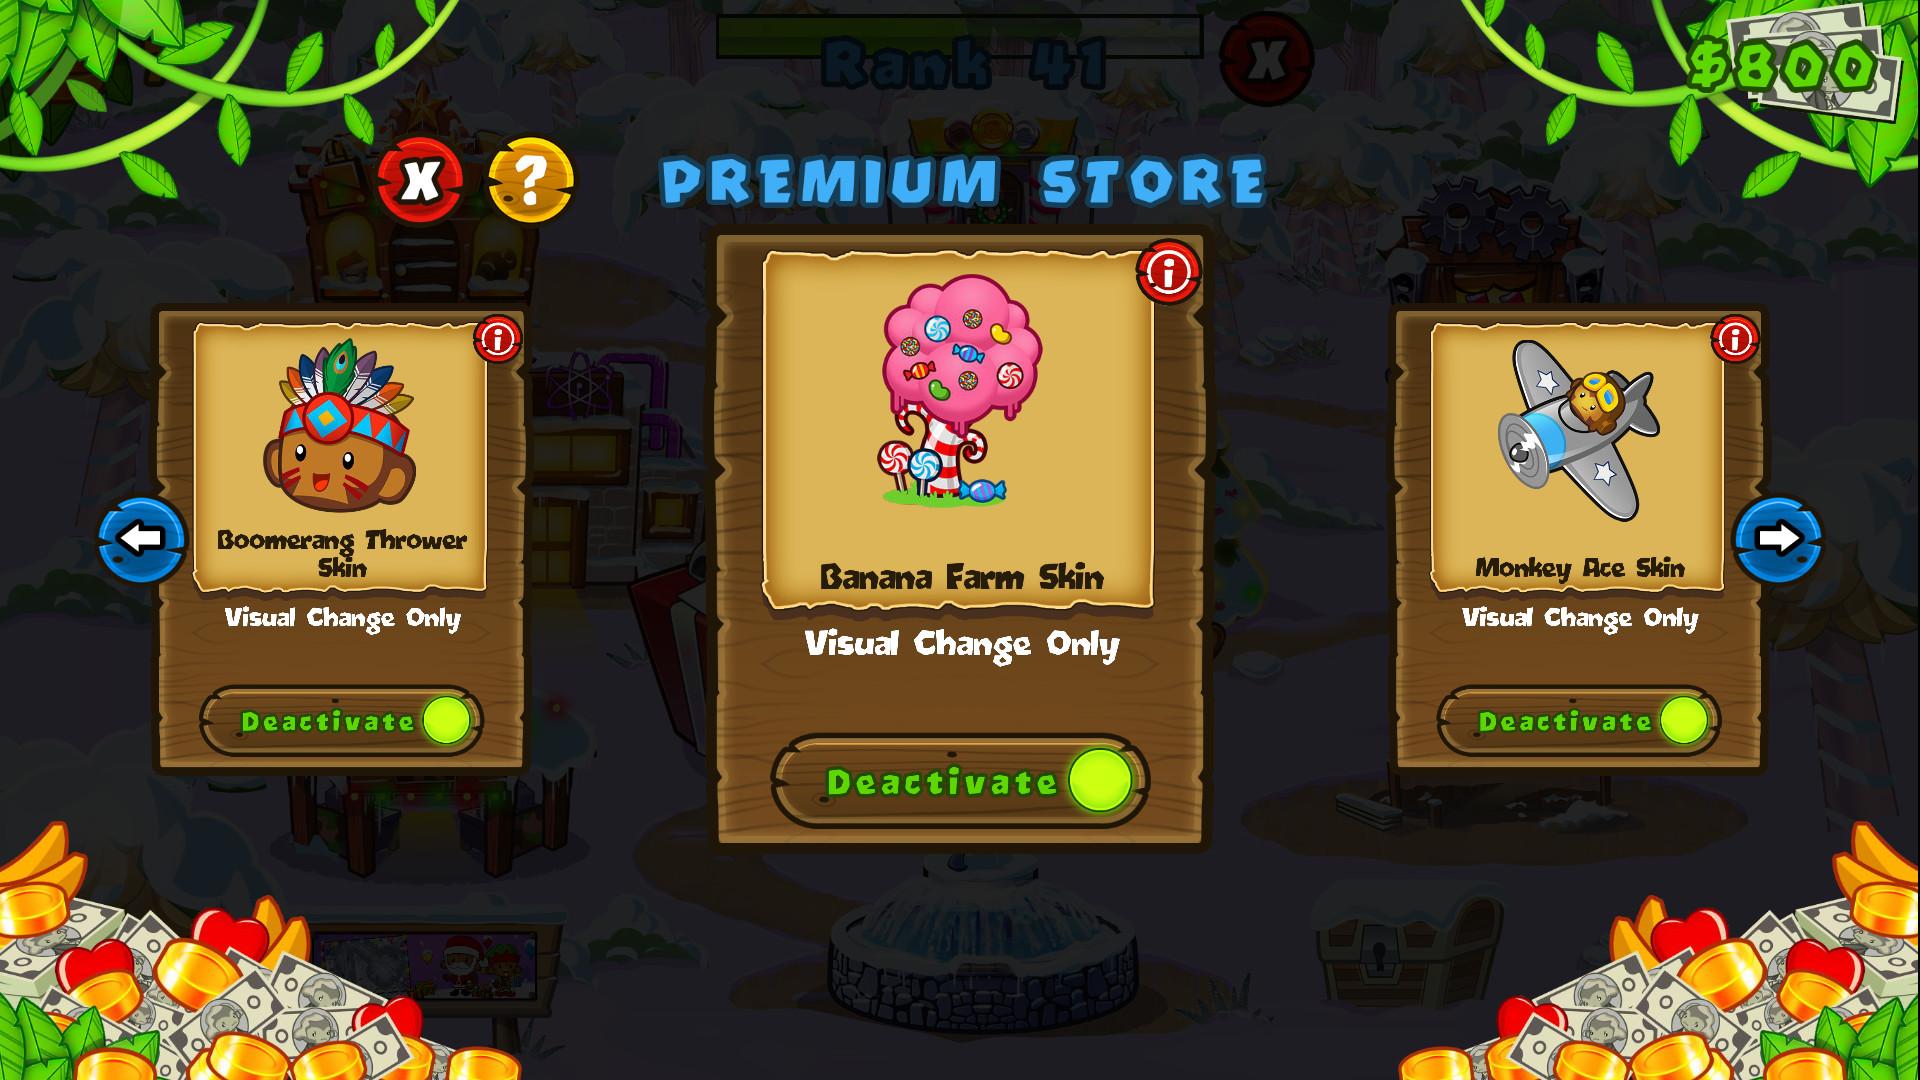 Bloons TD 5 - Candy Banana Farm Skin